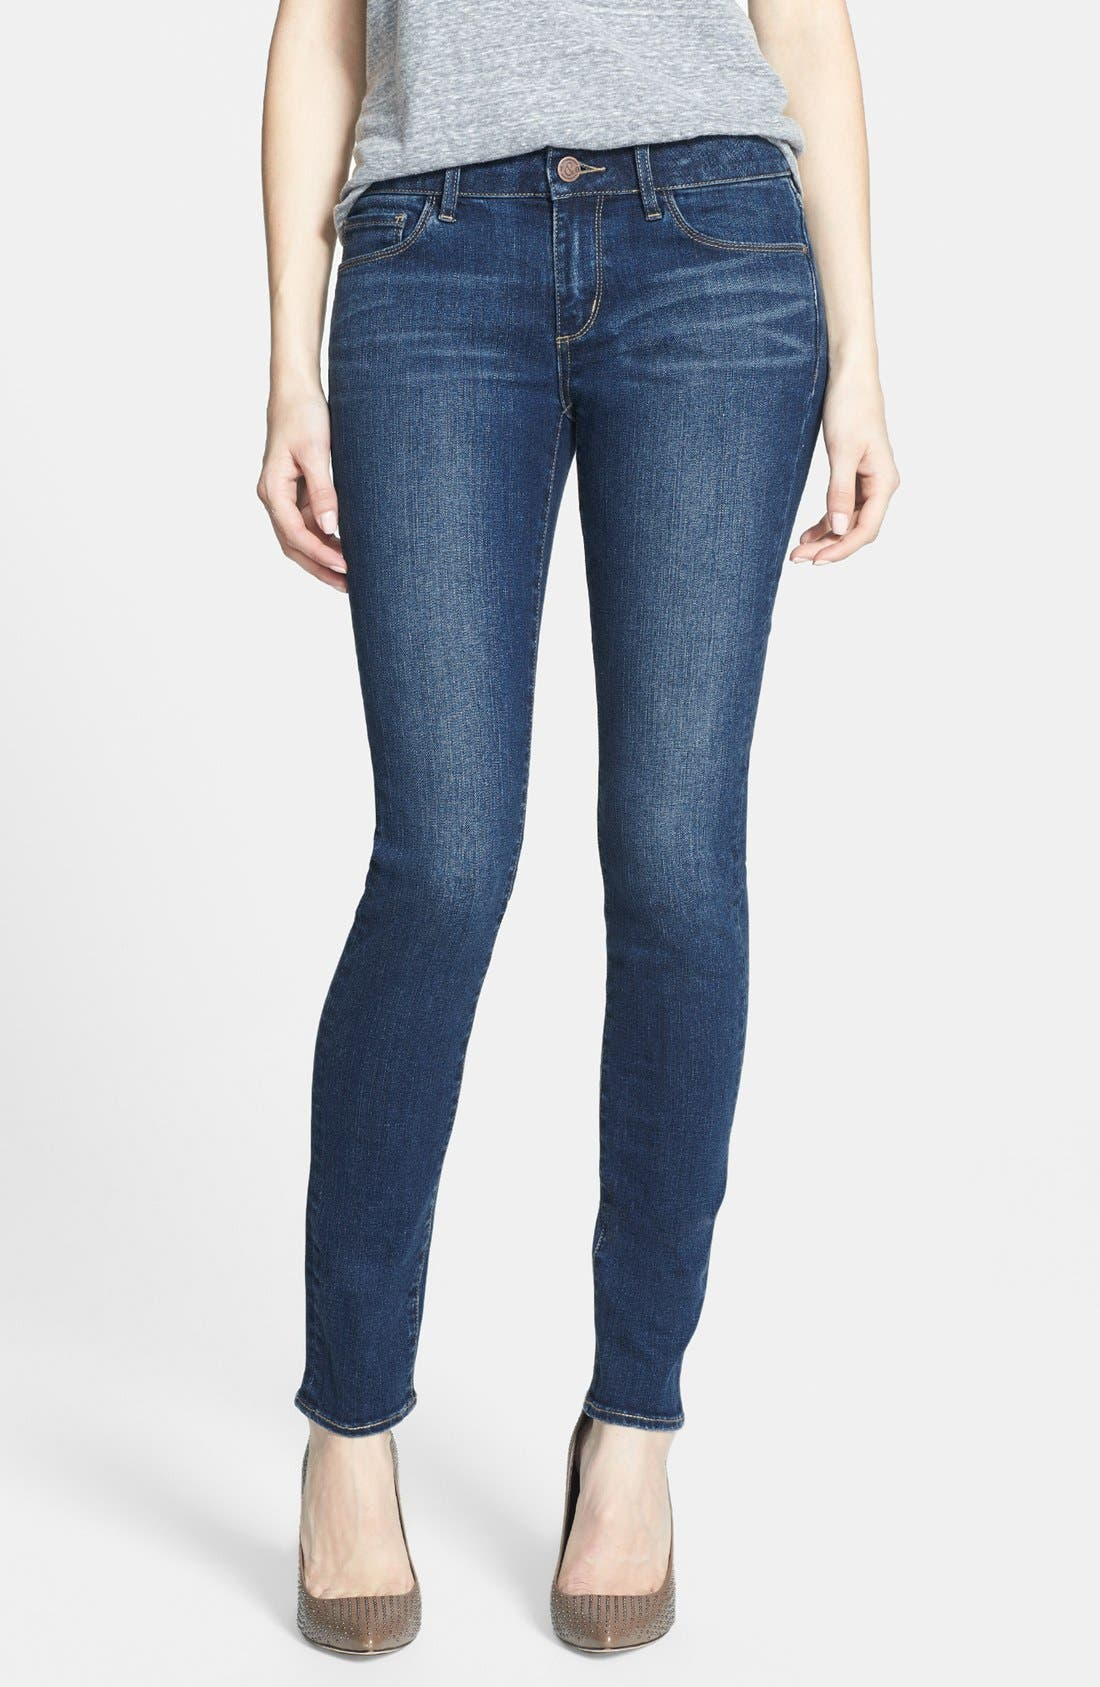 Alternate Image 1 Selected - Treasure&Bond Skinny Jeans (Medium)